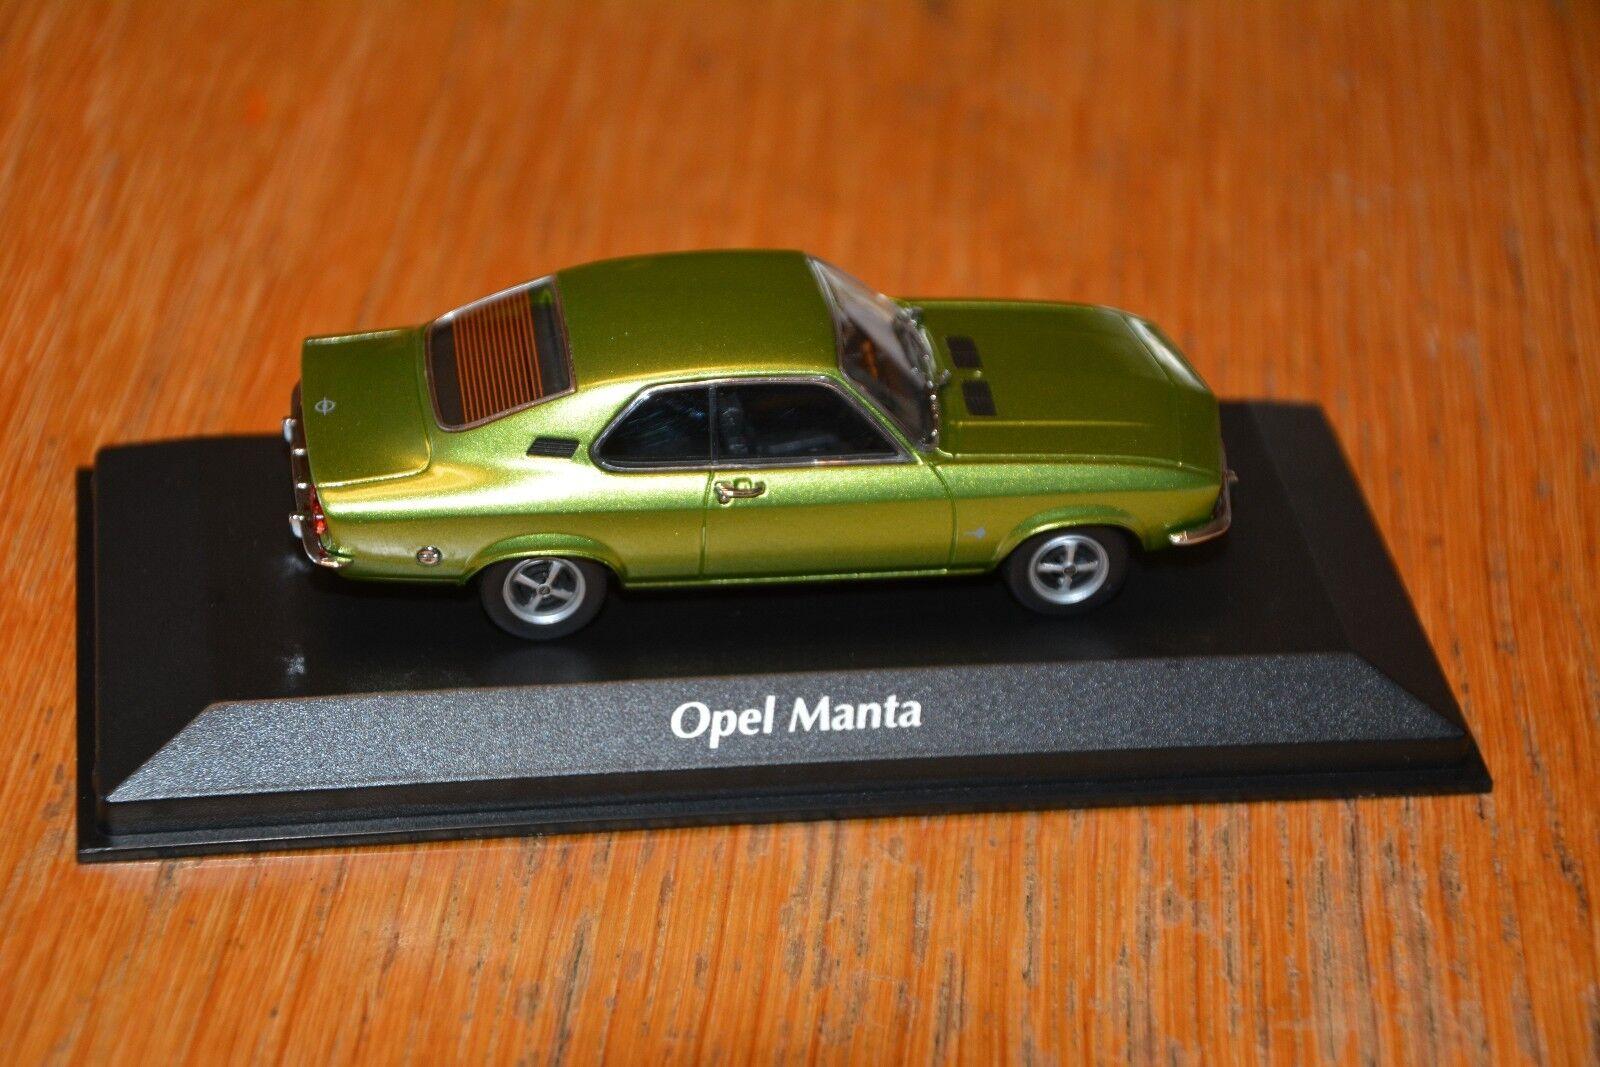 940 045501 Opel Manta A grünmetallic  neu 1 43    Verrückter Preis